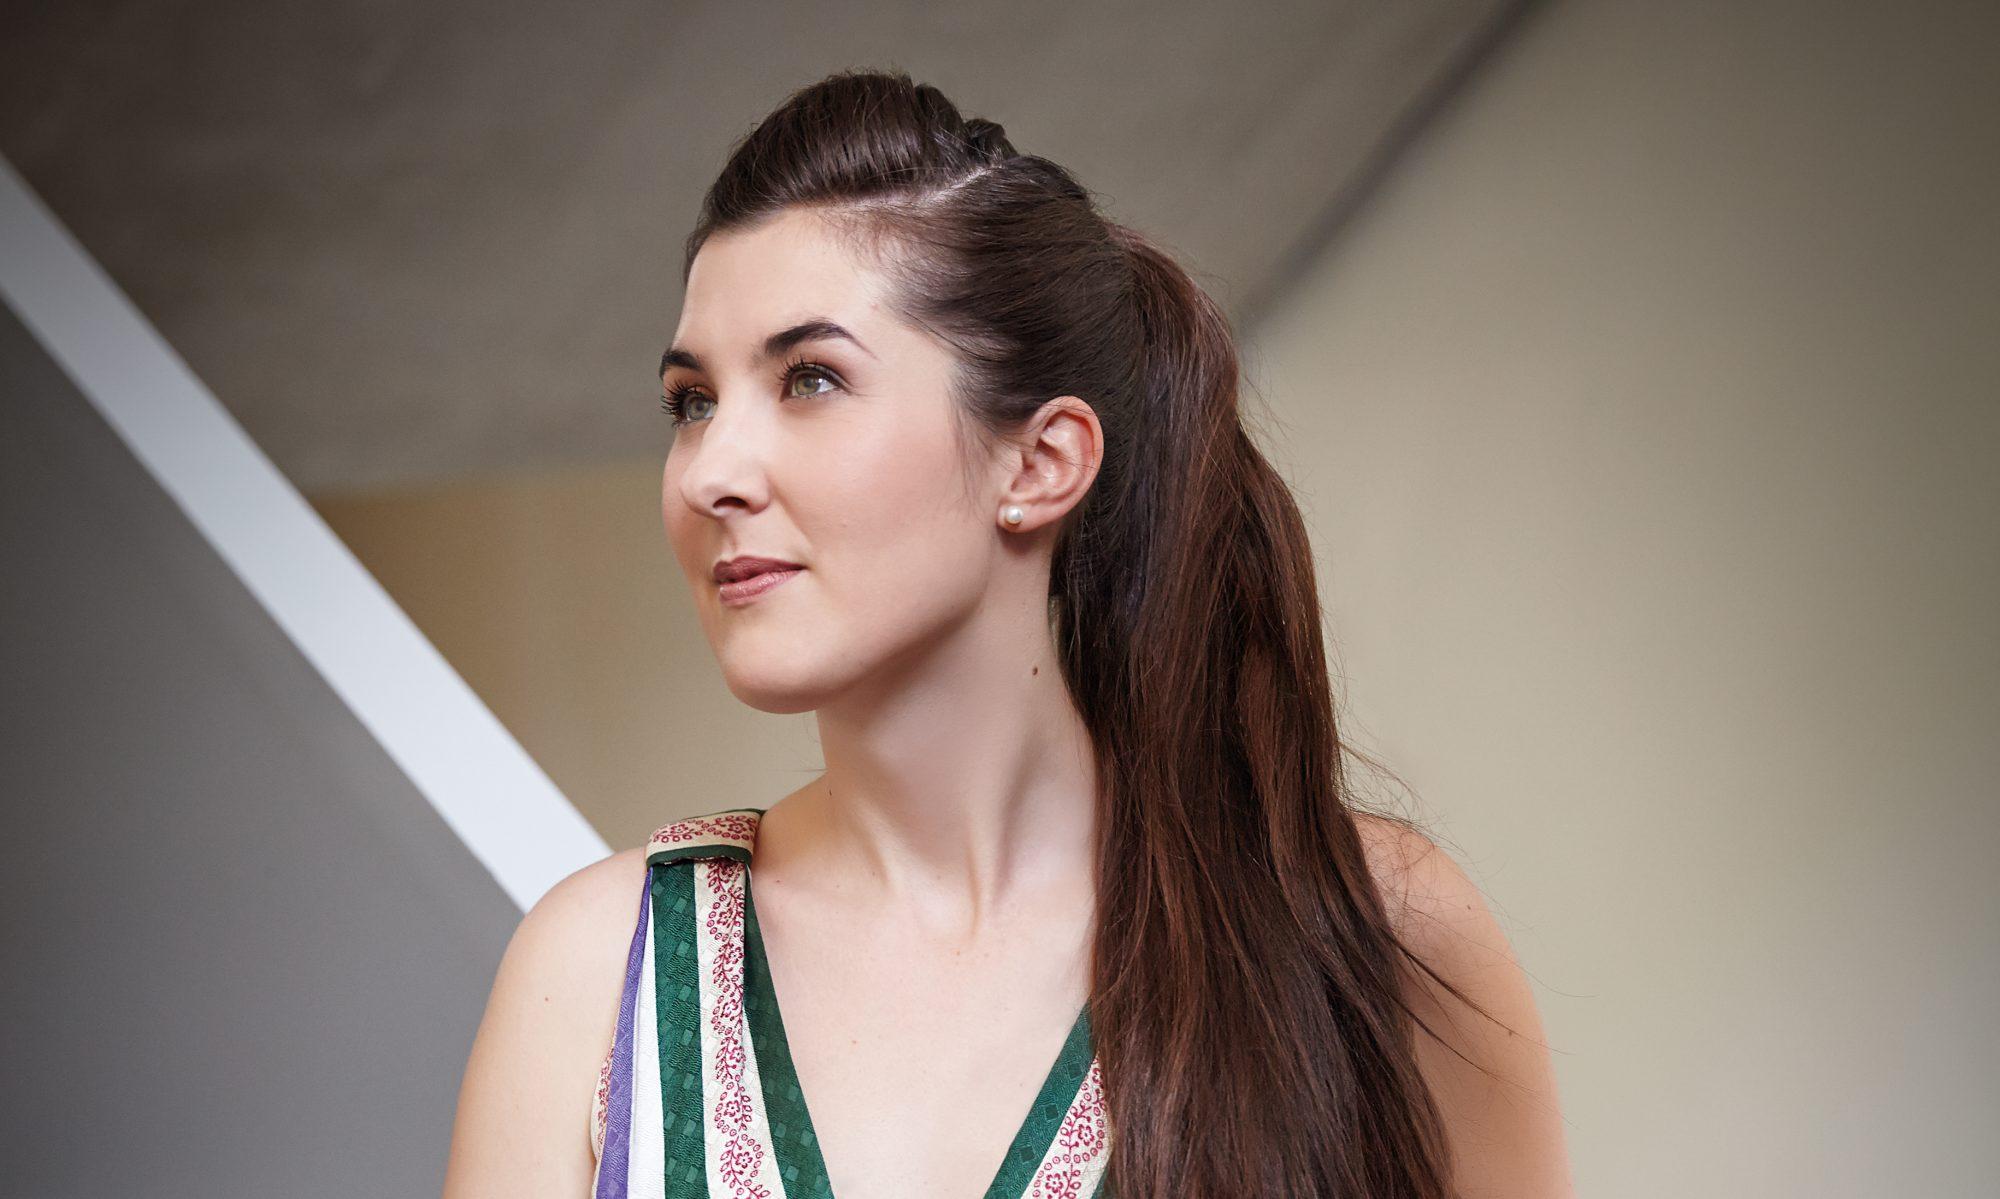 Viktoria McConnell